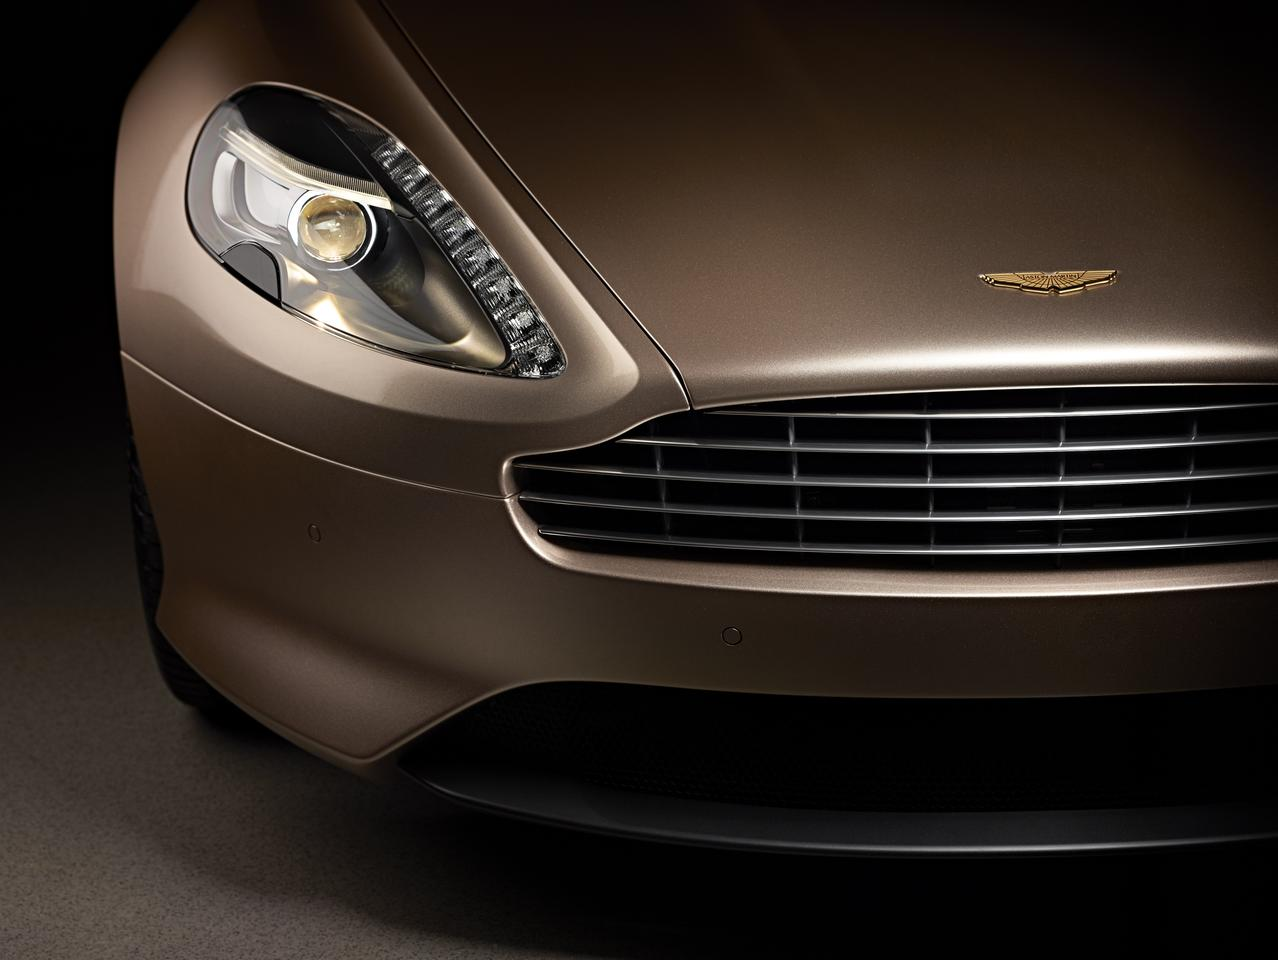 Aston Martin's Dragon 88 special edition